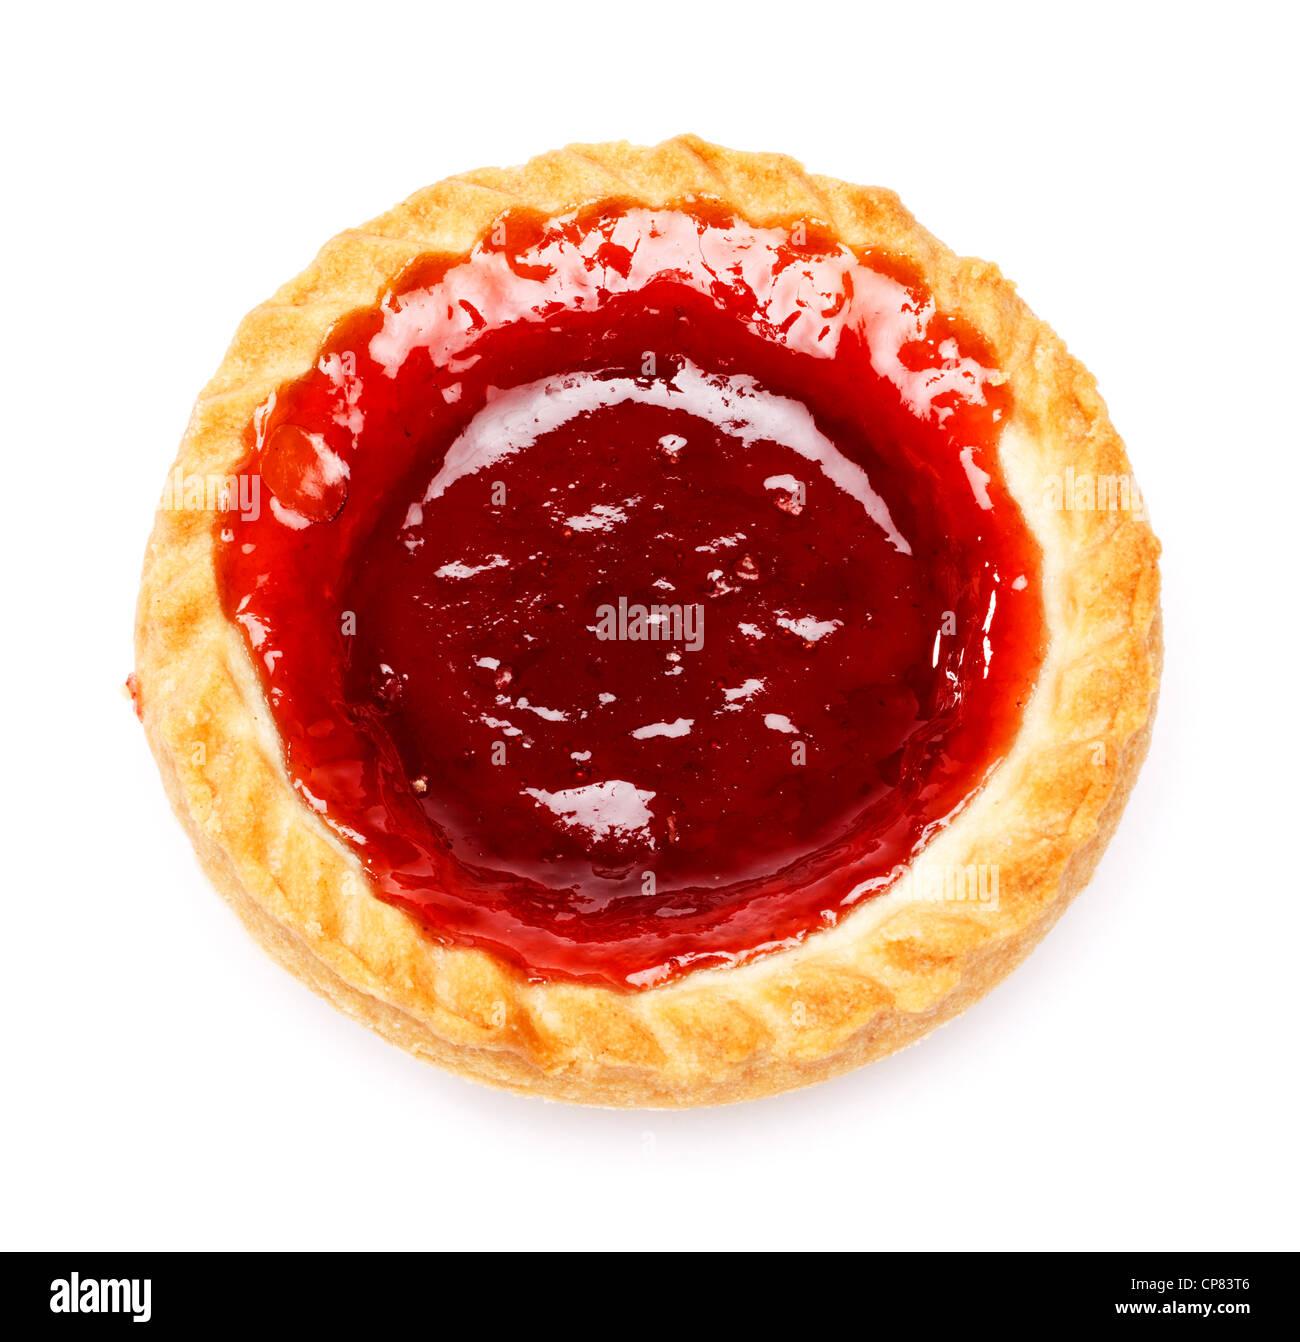 jam tarts evaluation